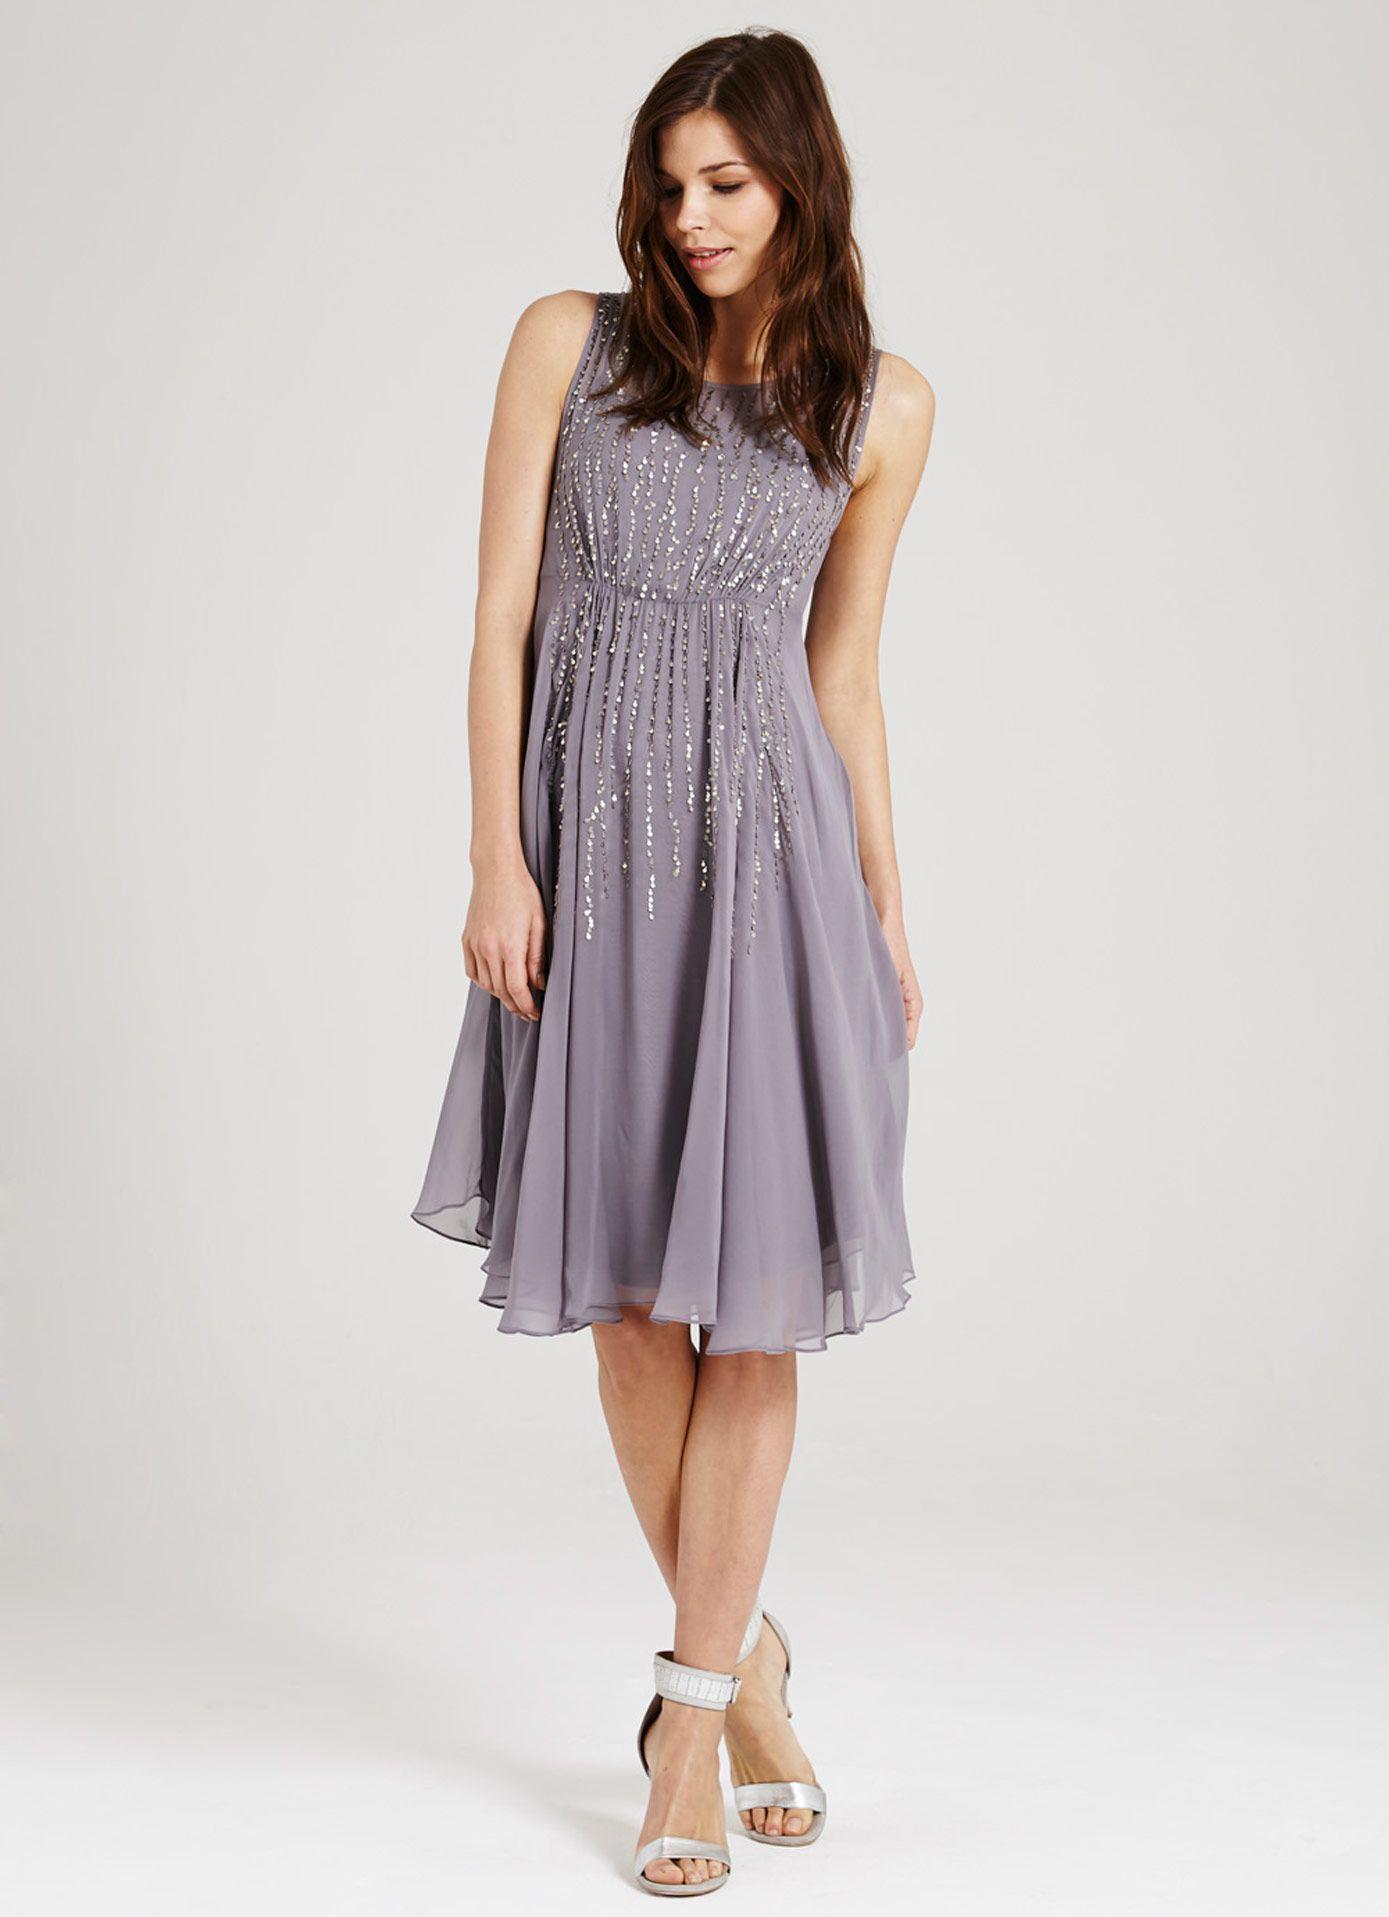 Platinum Droplet Dress | Dresses & Jumpsuits | MintVelvet ...